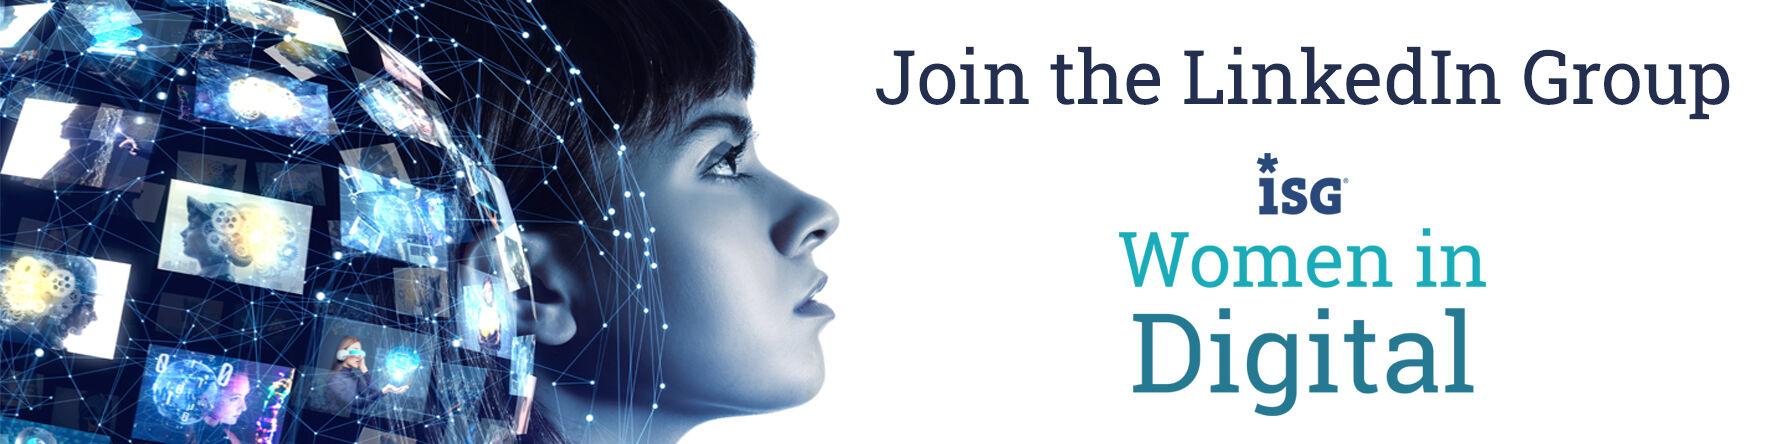 Women-in-Digital-LinkedIn-Header